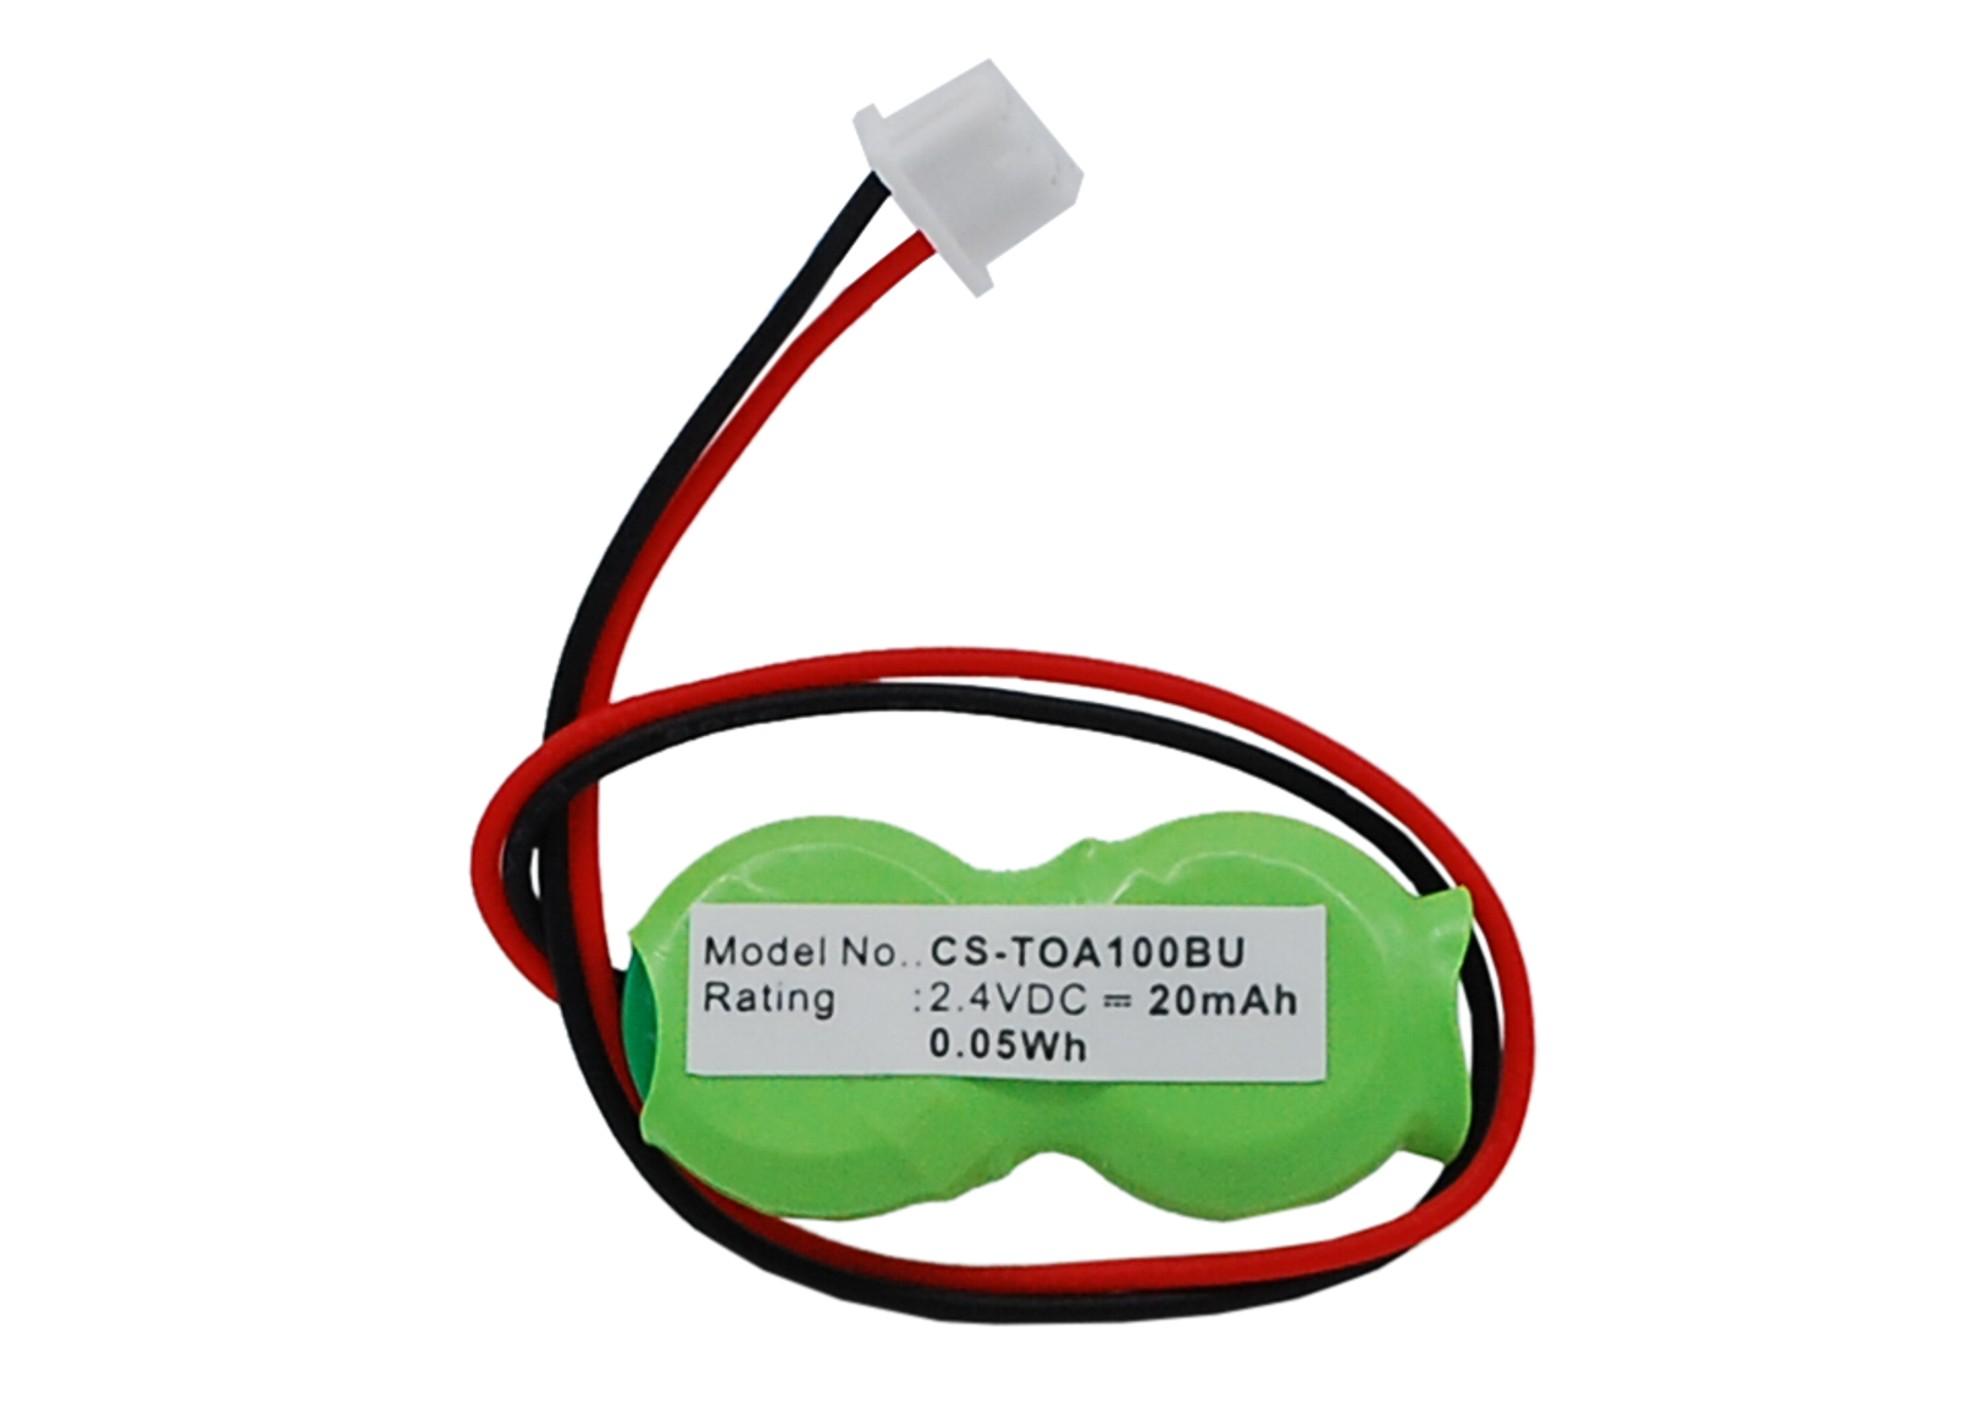 Cameron Sino baterie cmos pro TOSHIBA Portege R600-S4202 2.4V Ni-MH 20mAh zelená - neoriginální